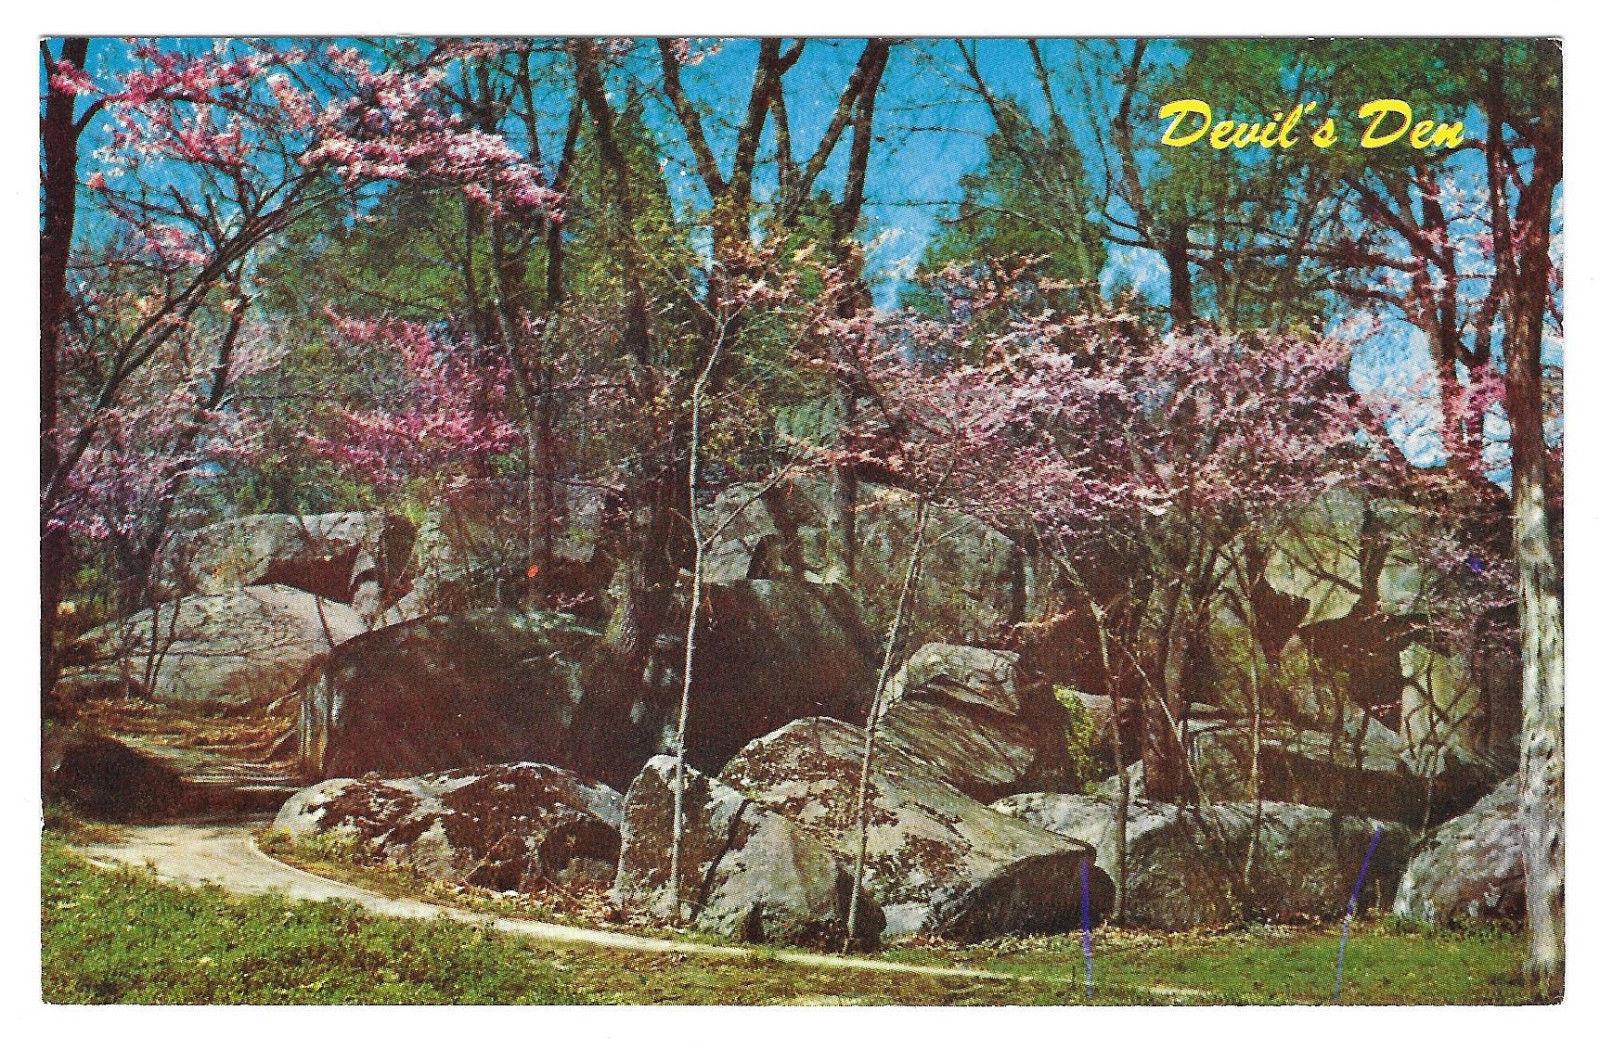 Gettysburg Civil War Devil's Den Vtg L.E. Smith Postcard PA Mike Roberts